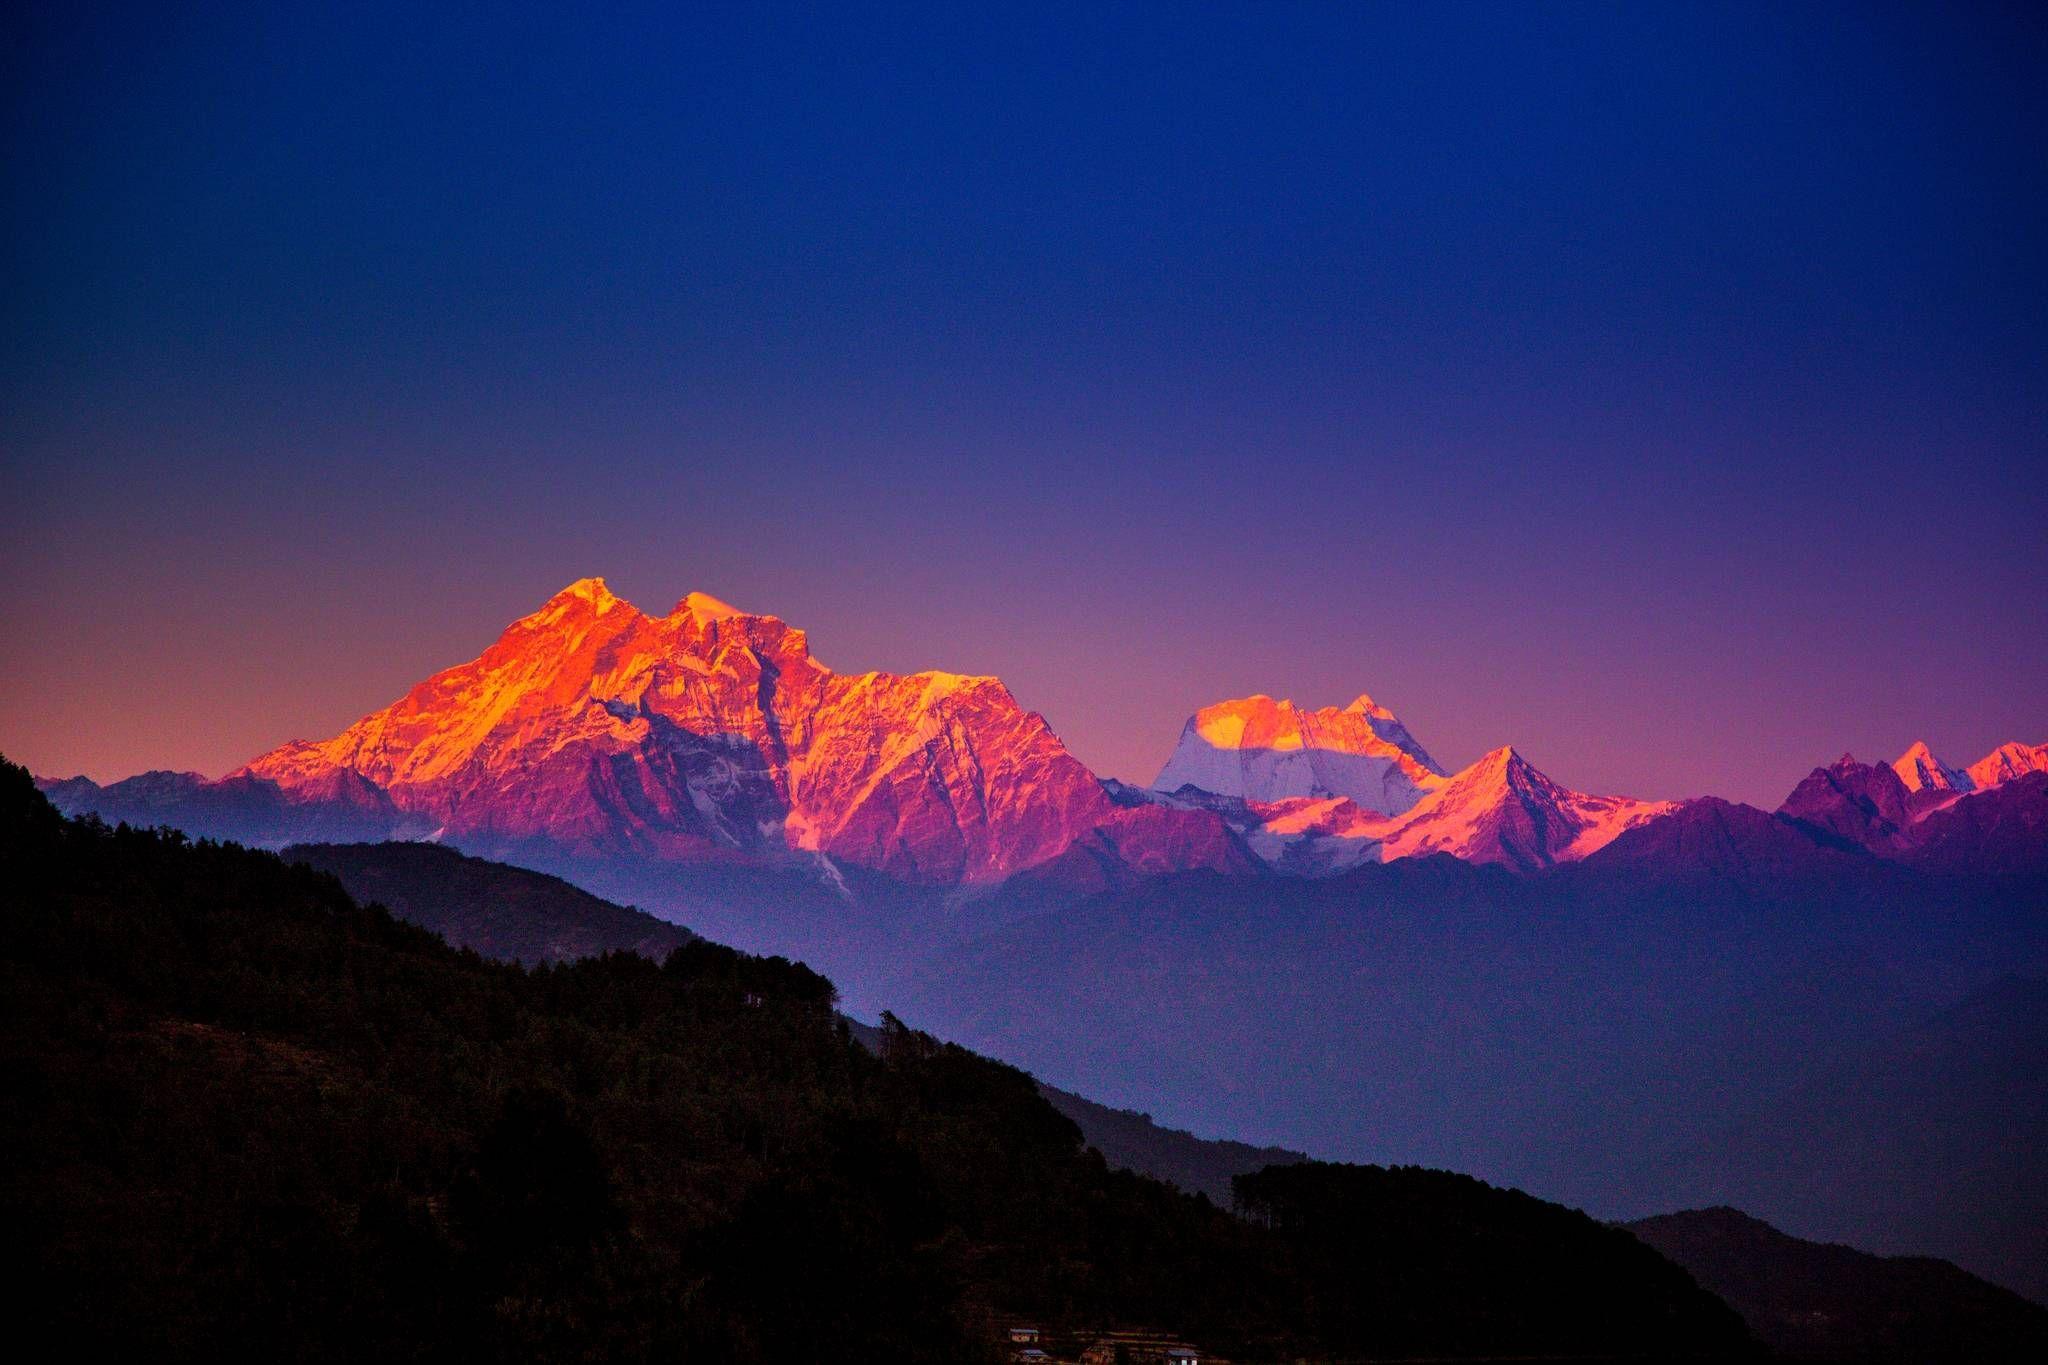 Pin By Susan Villegas On Enjoy The View Mountains Wallpaper Nepal